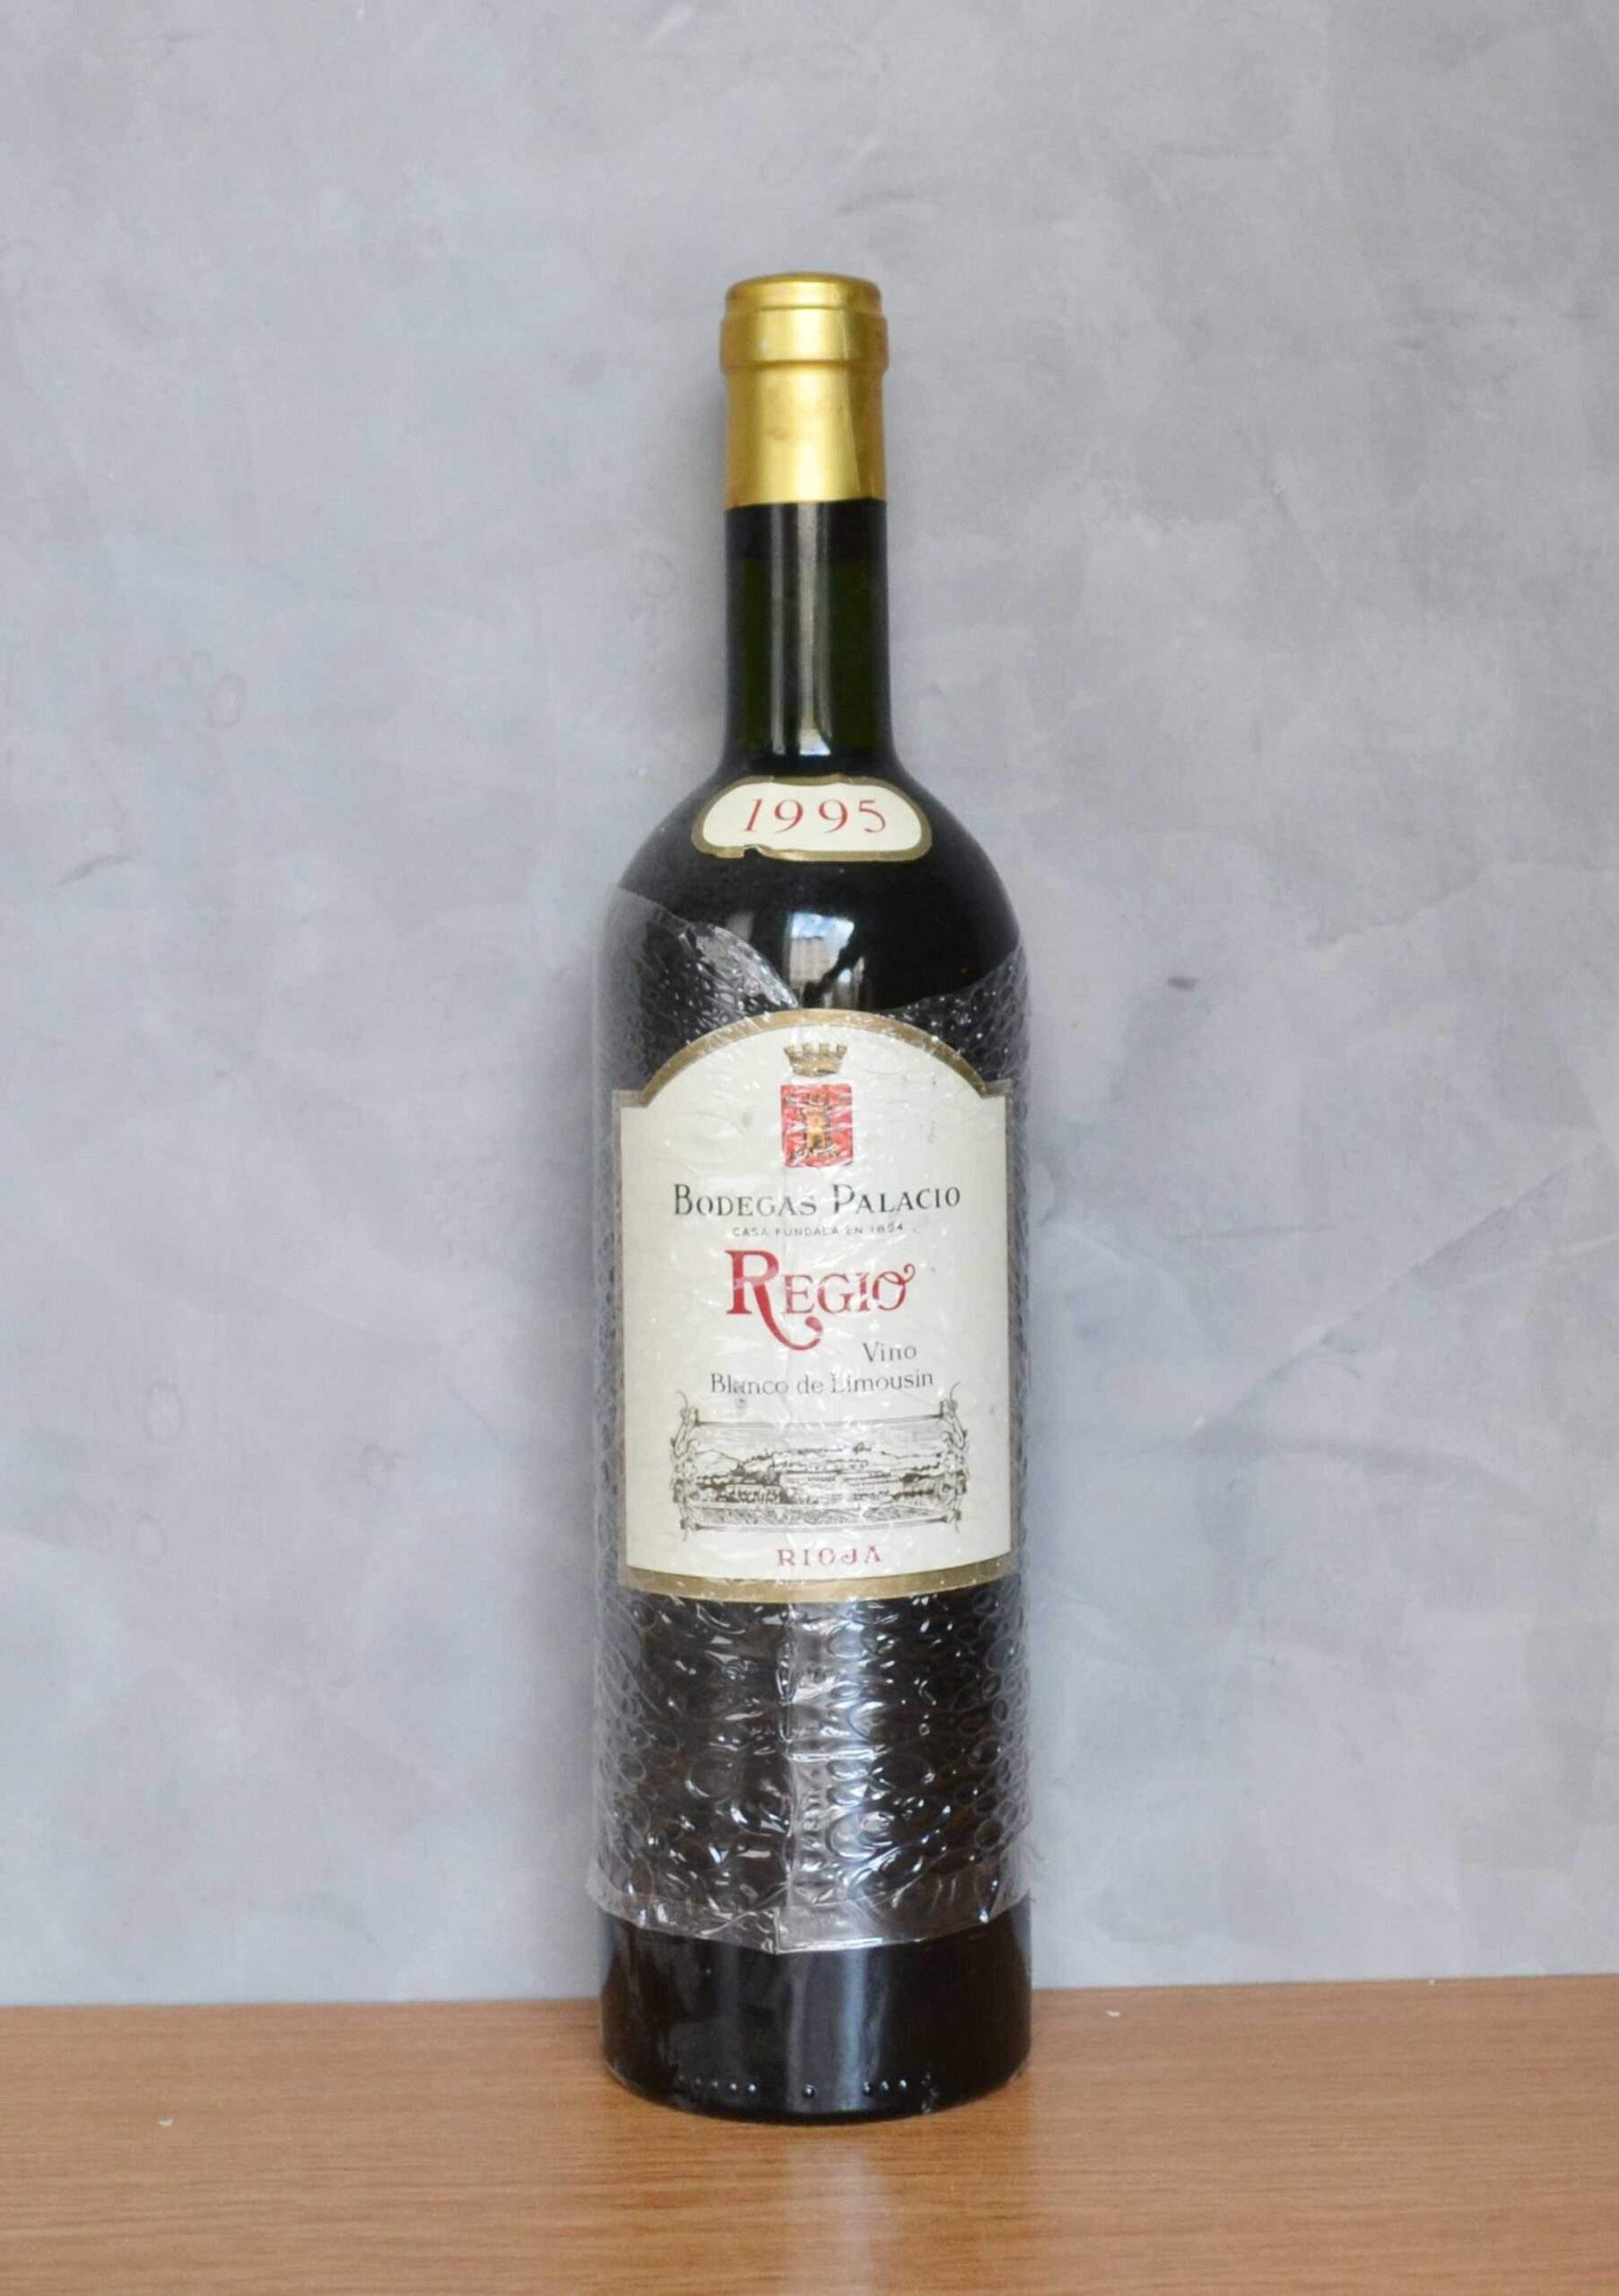 wineries palace regio 1995